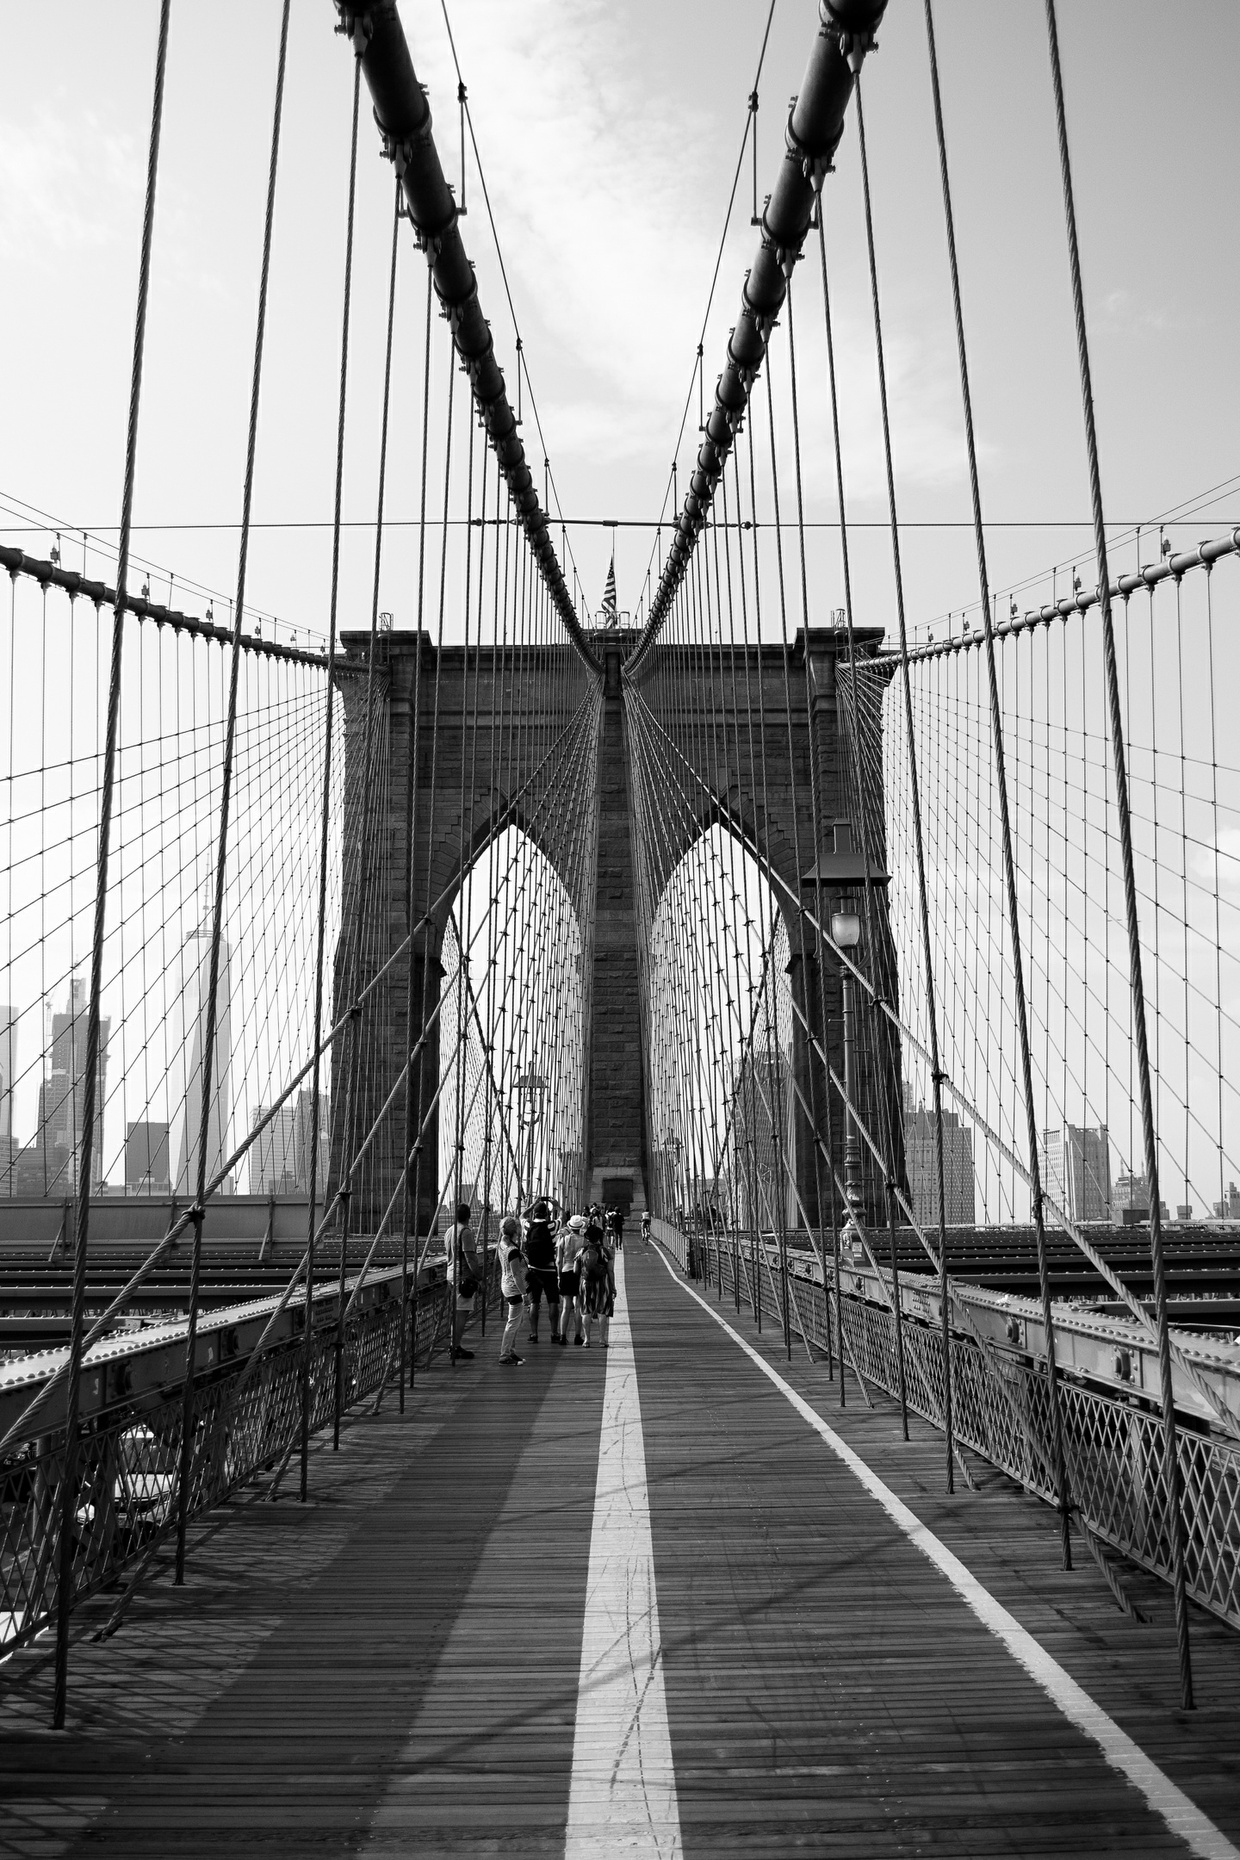 New York Stories 3 - Brooklyn Bridge